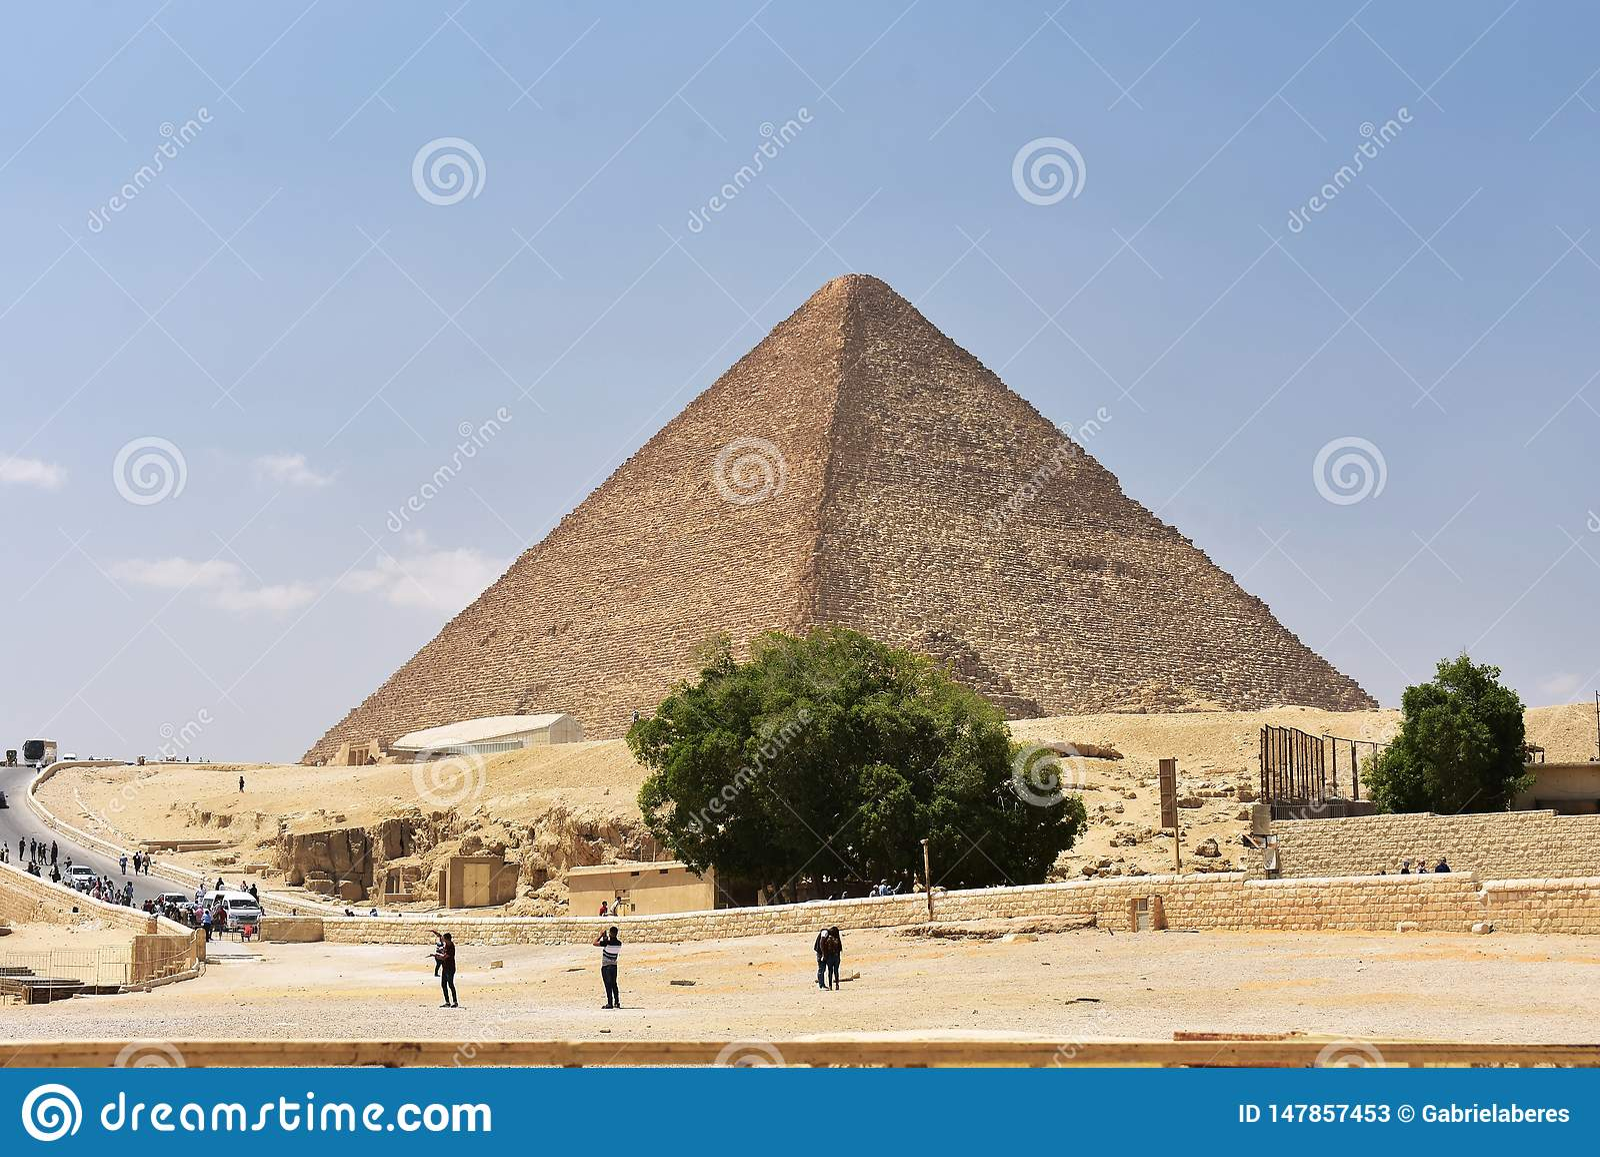 May, 6, 2019  The Great Pyramid Of Giza, Egypt Editorial